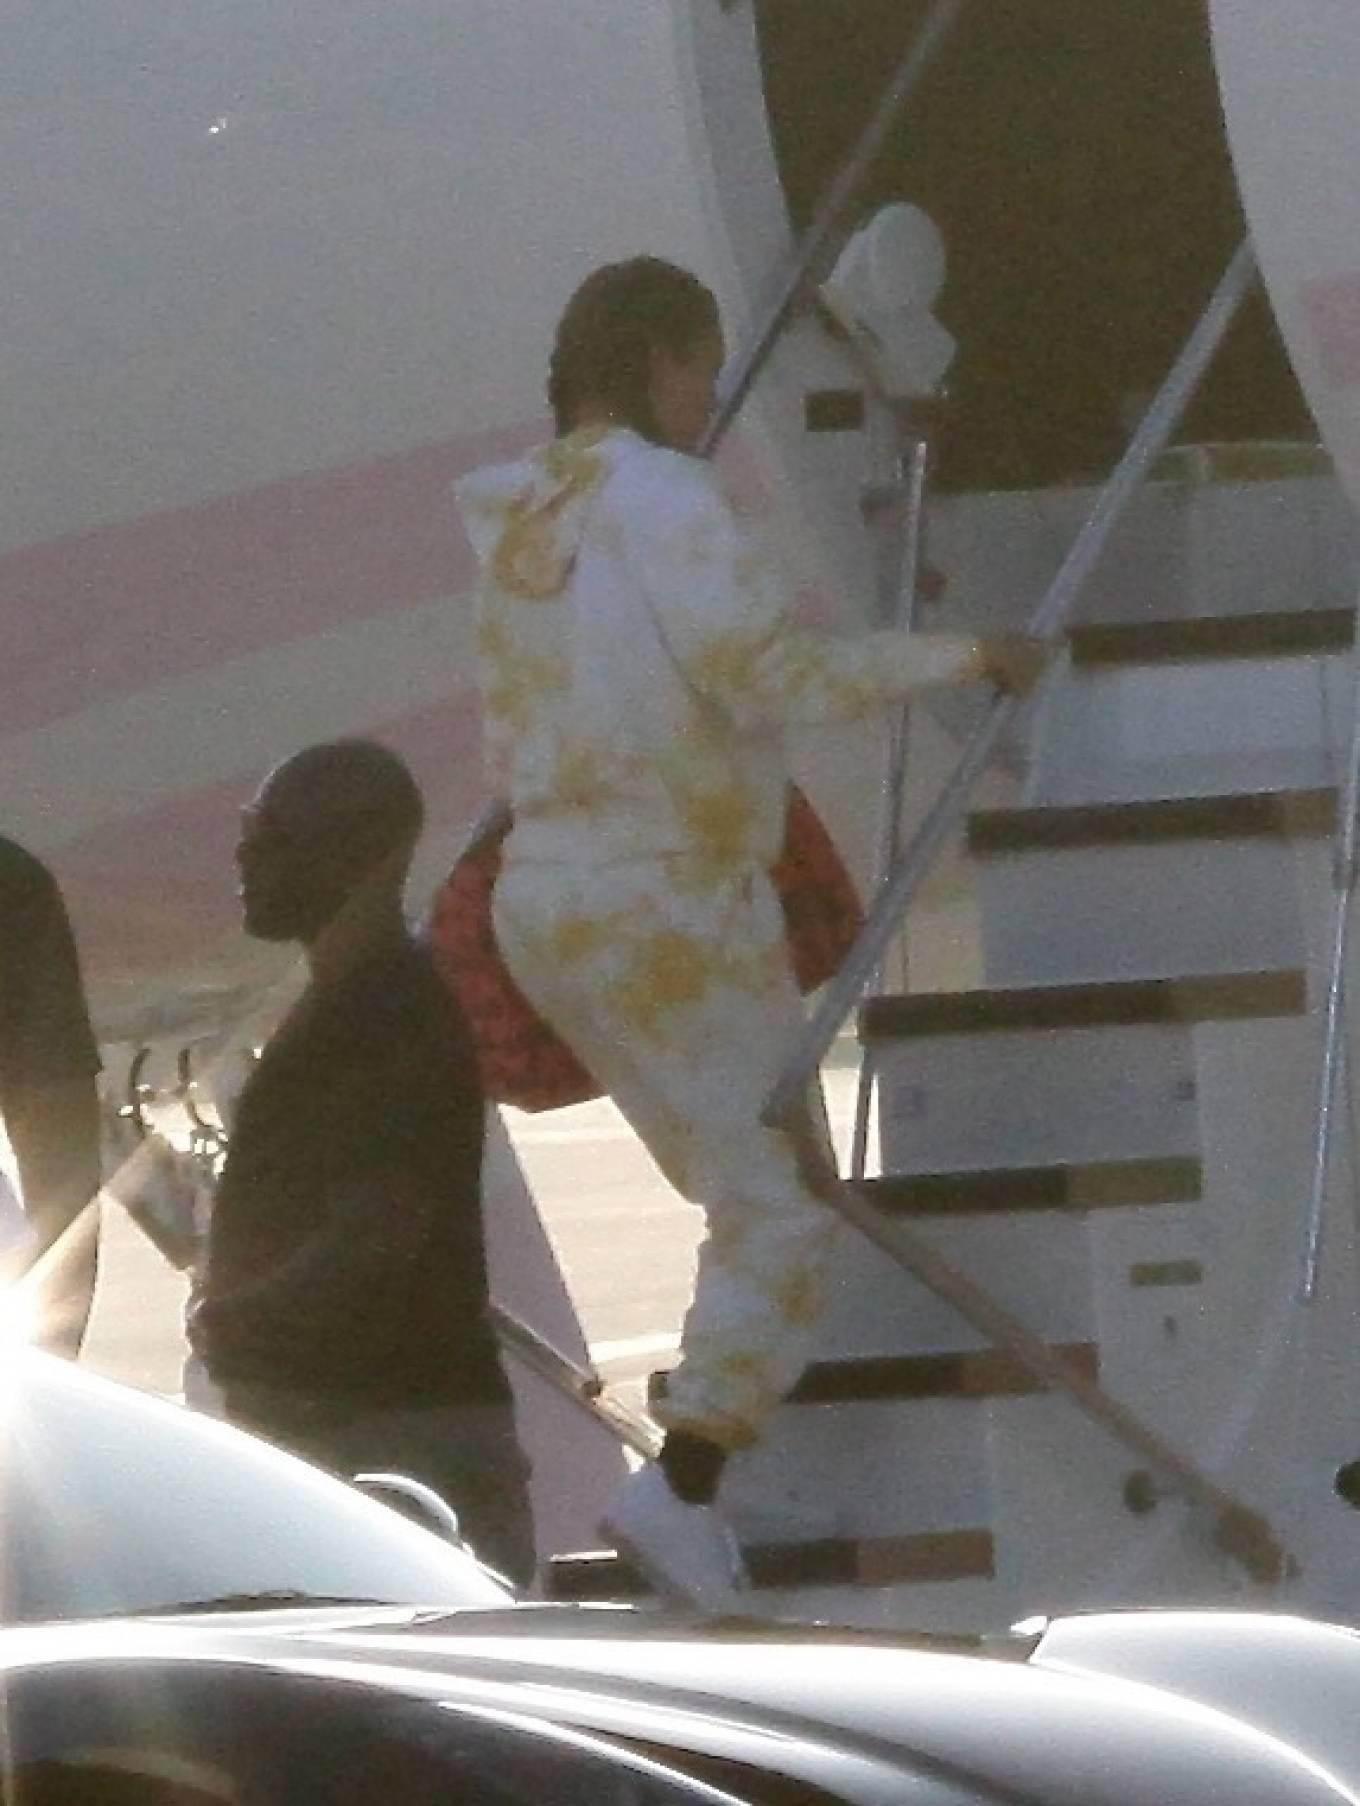 Khloe Kardashian 2020 : Khloe Kardashian and Kourtney Kardashian – Pictured boarding Kylie Jenners private jet in Van Nuys-17